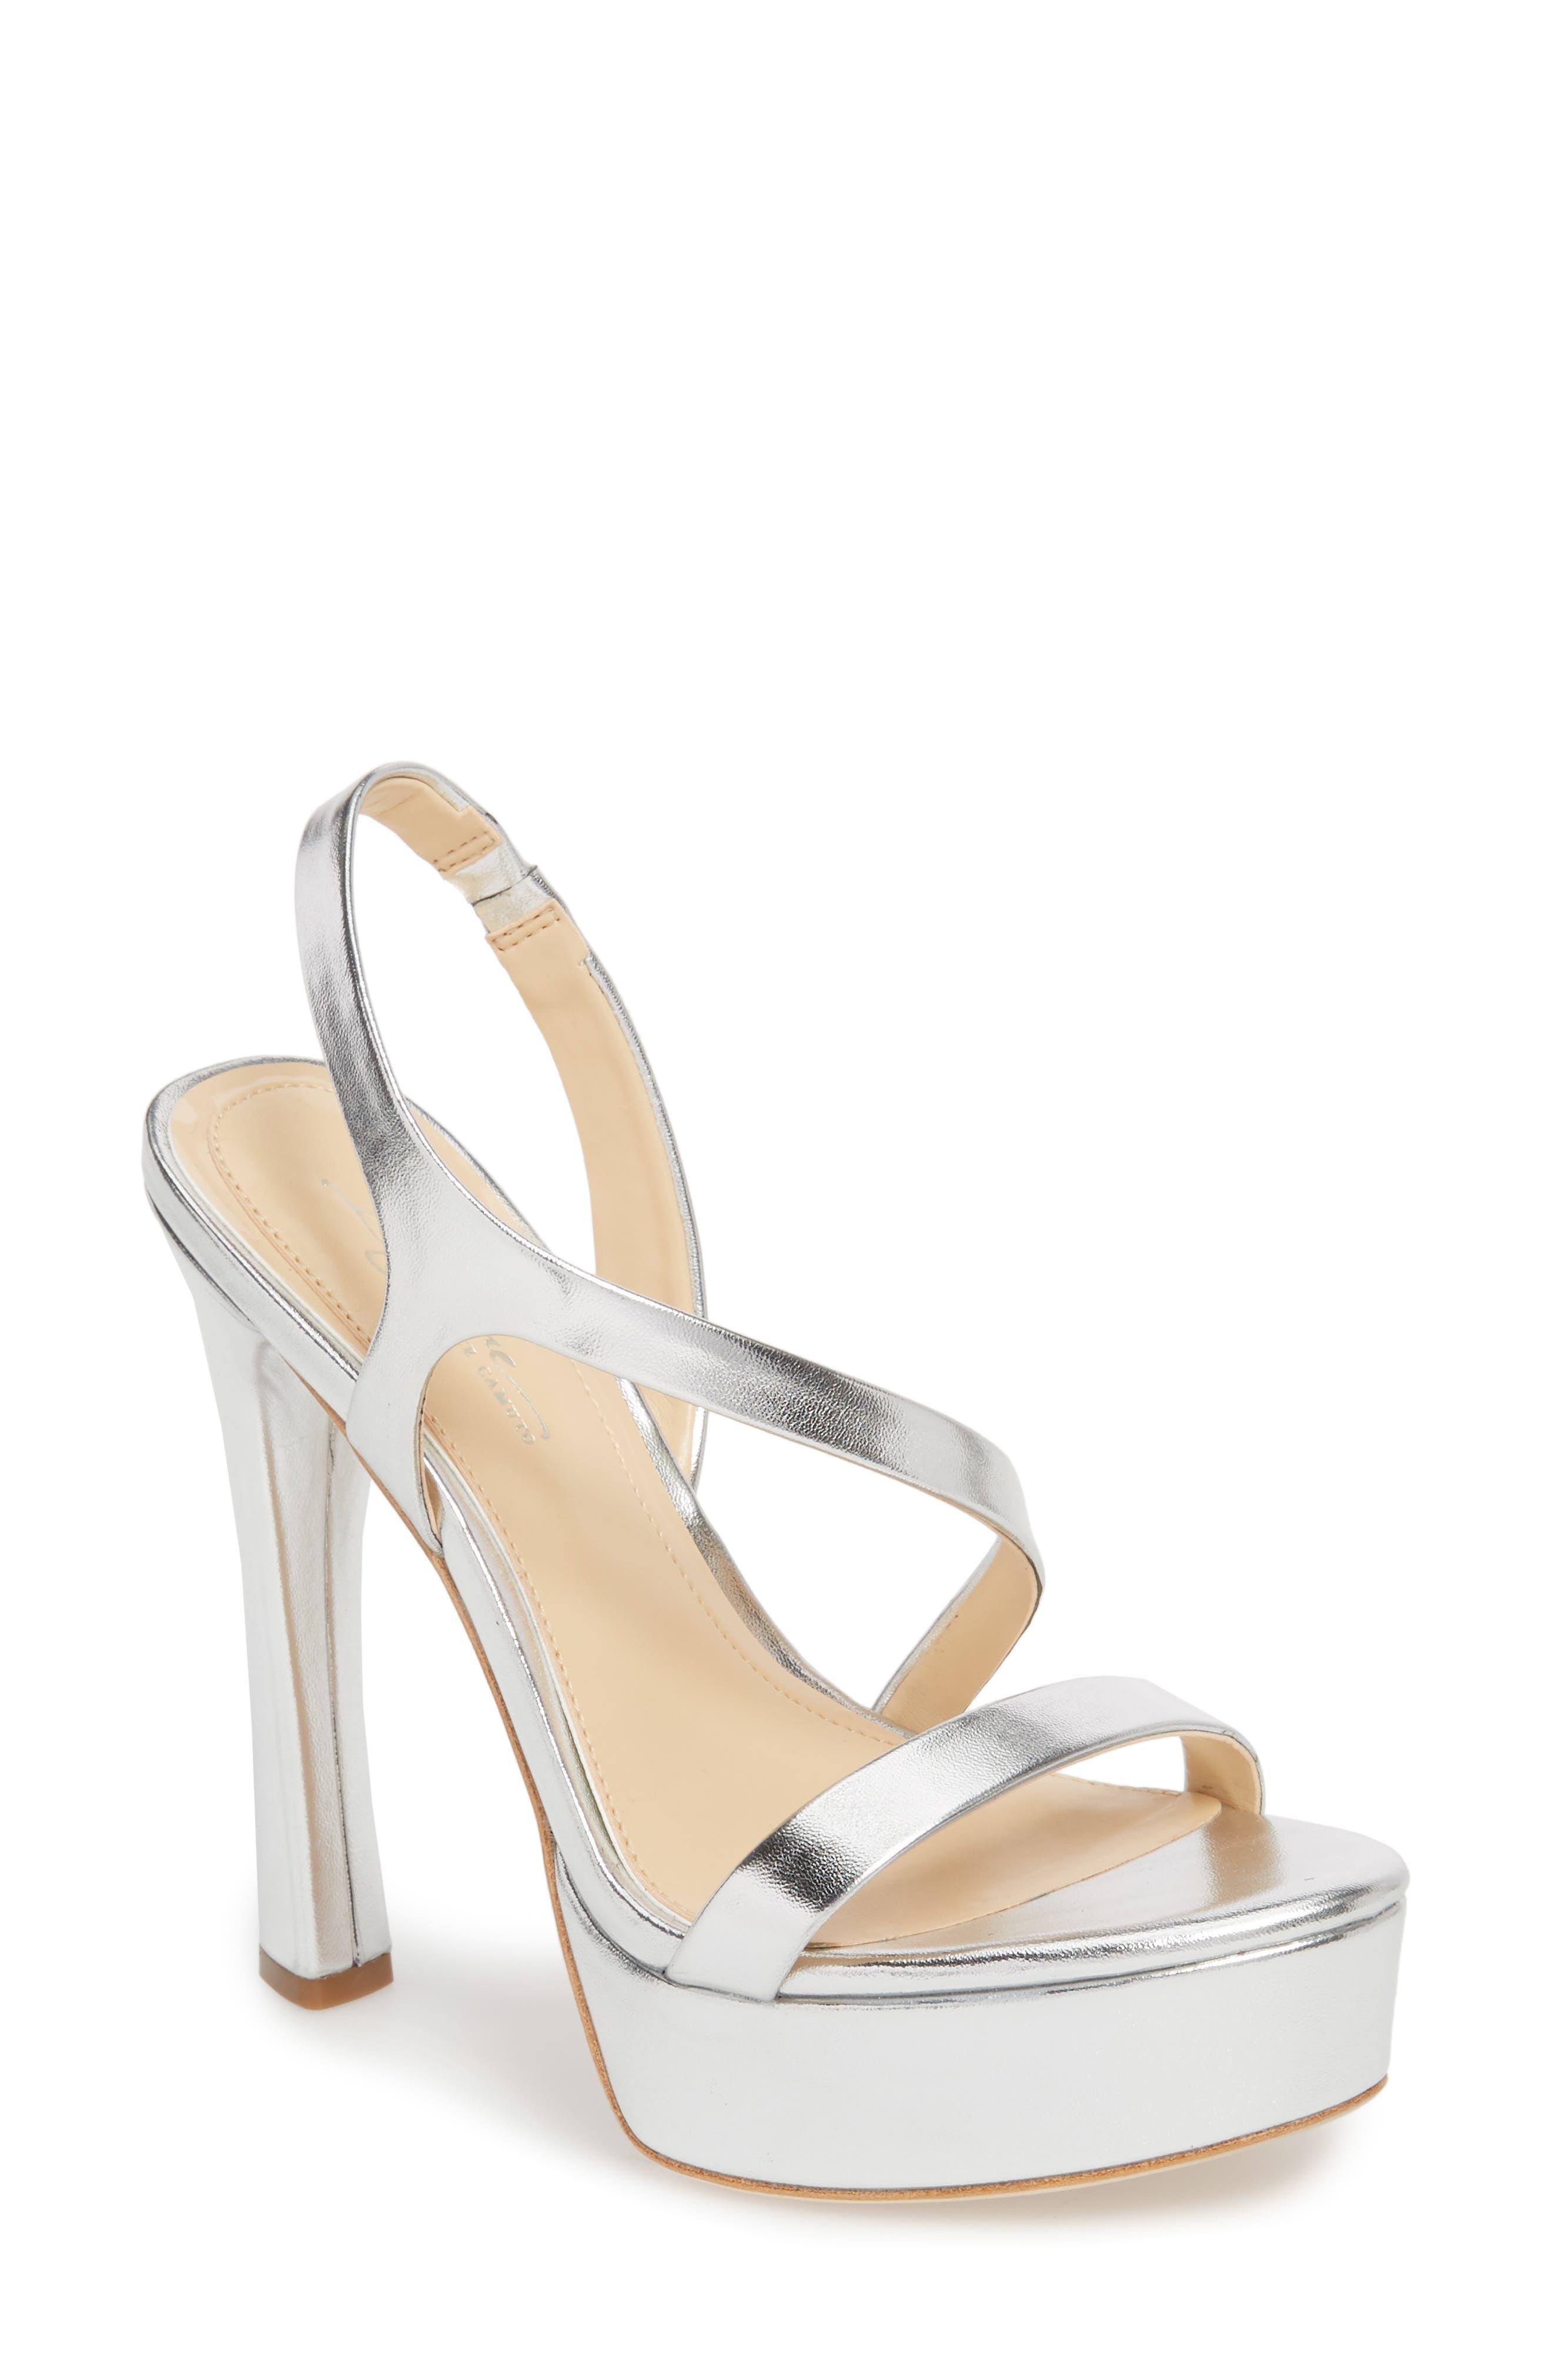 Imagine By Vince Camuto Piera Platform Sandal, Metallic